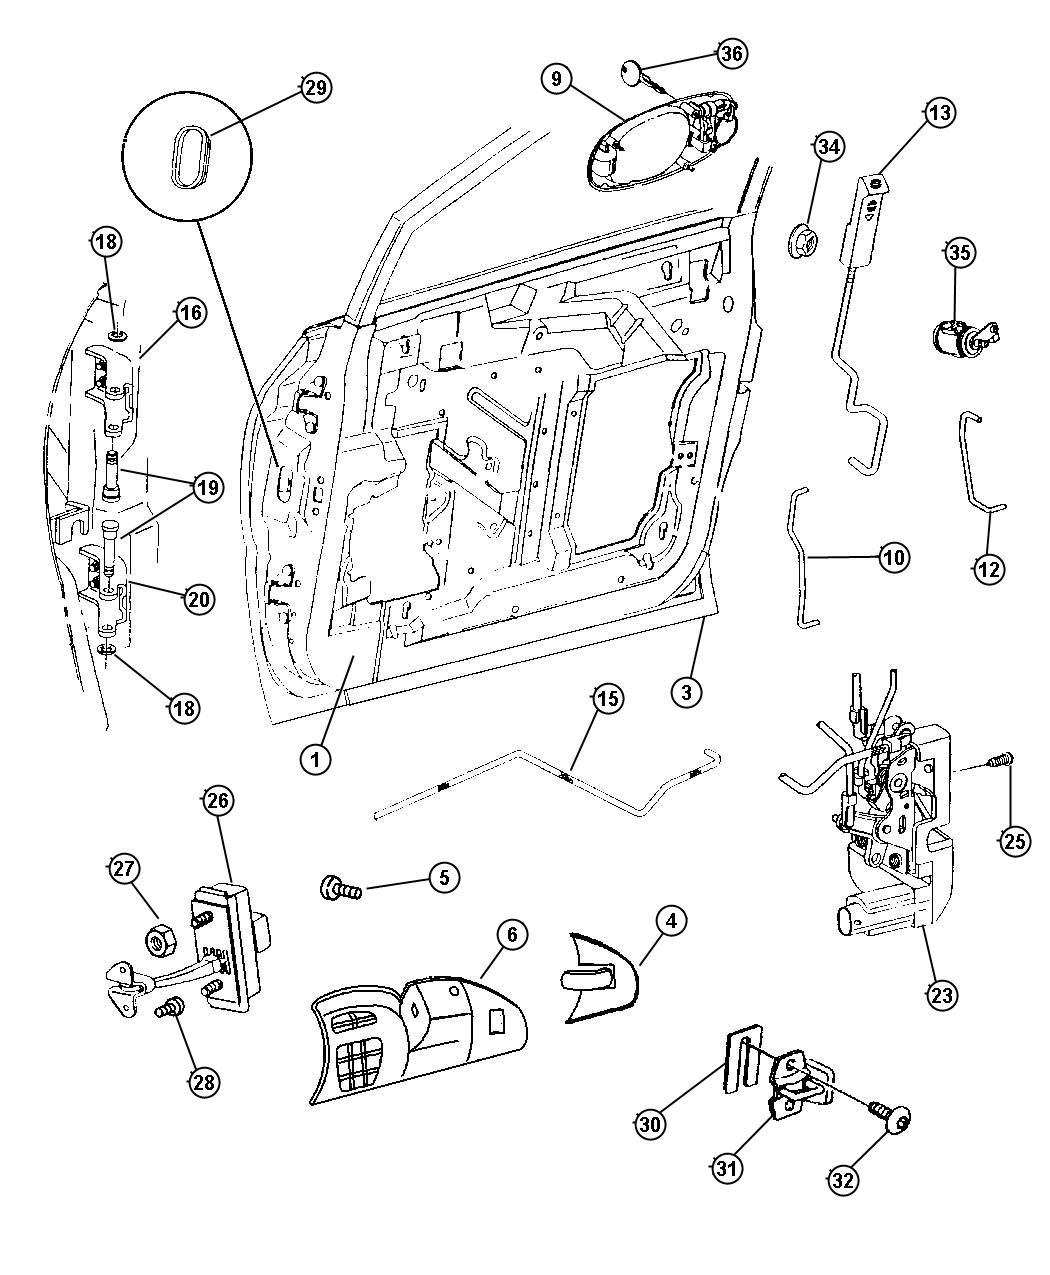 Chrysler Voyager Key. Blank. 84 groove. Black, primary